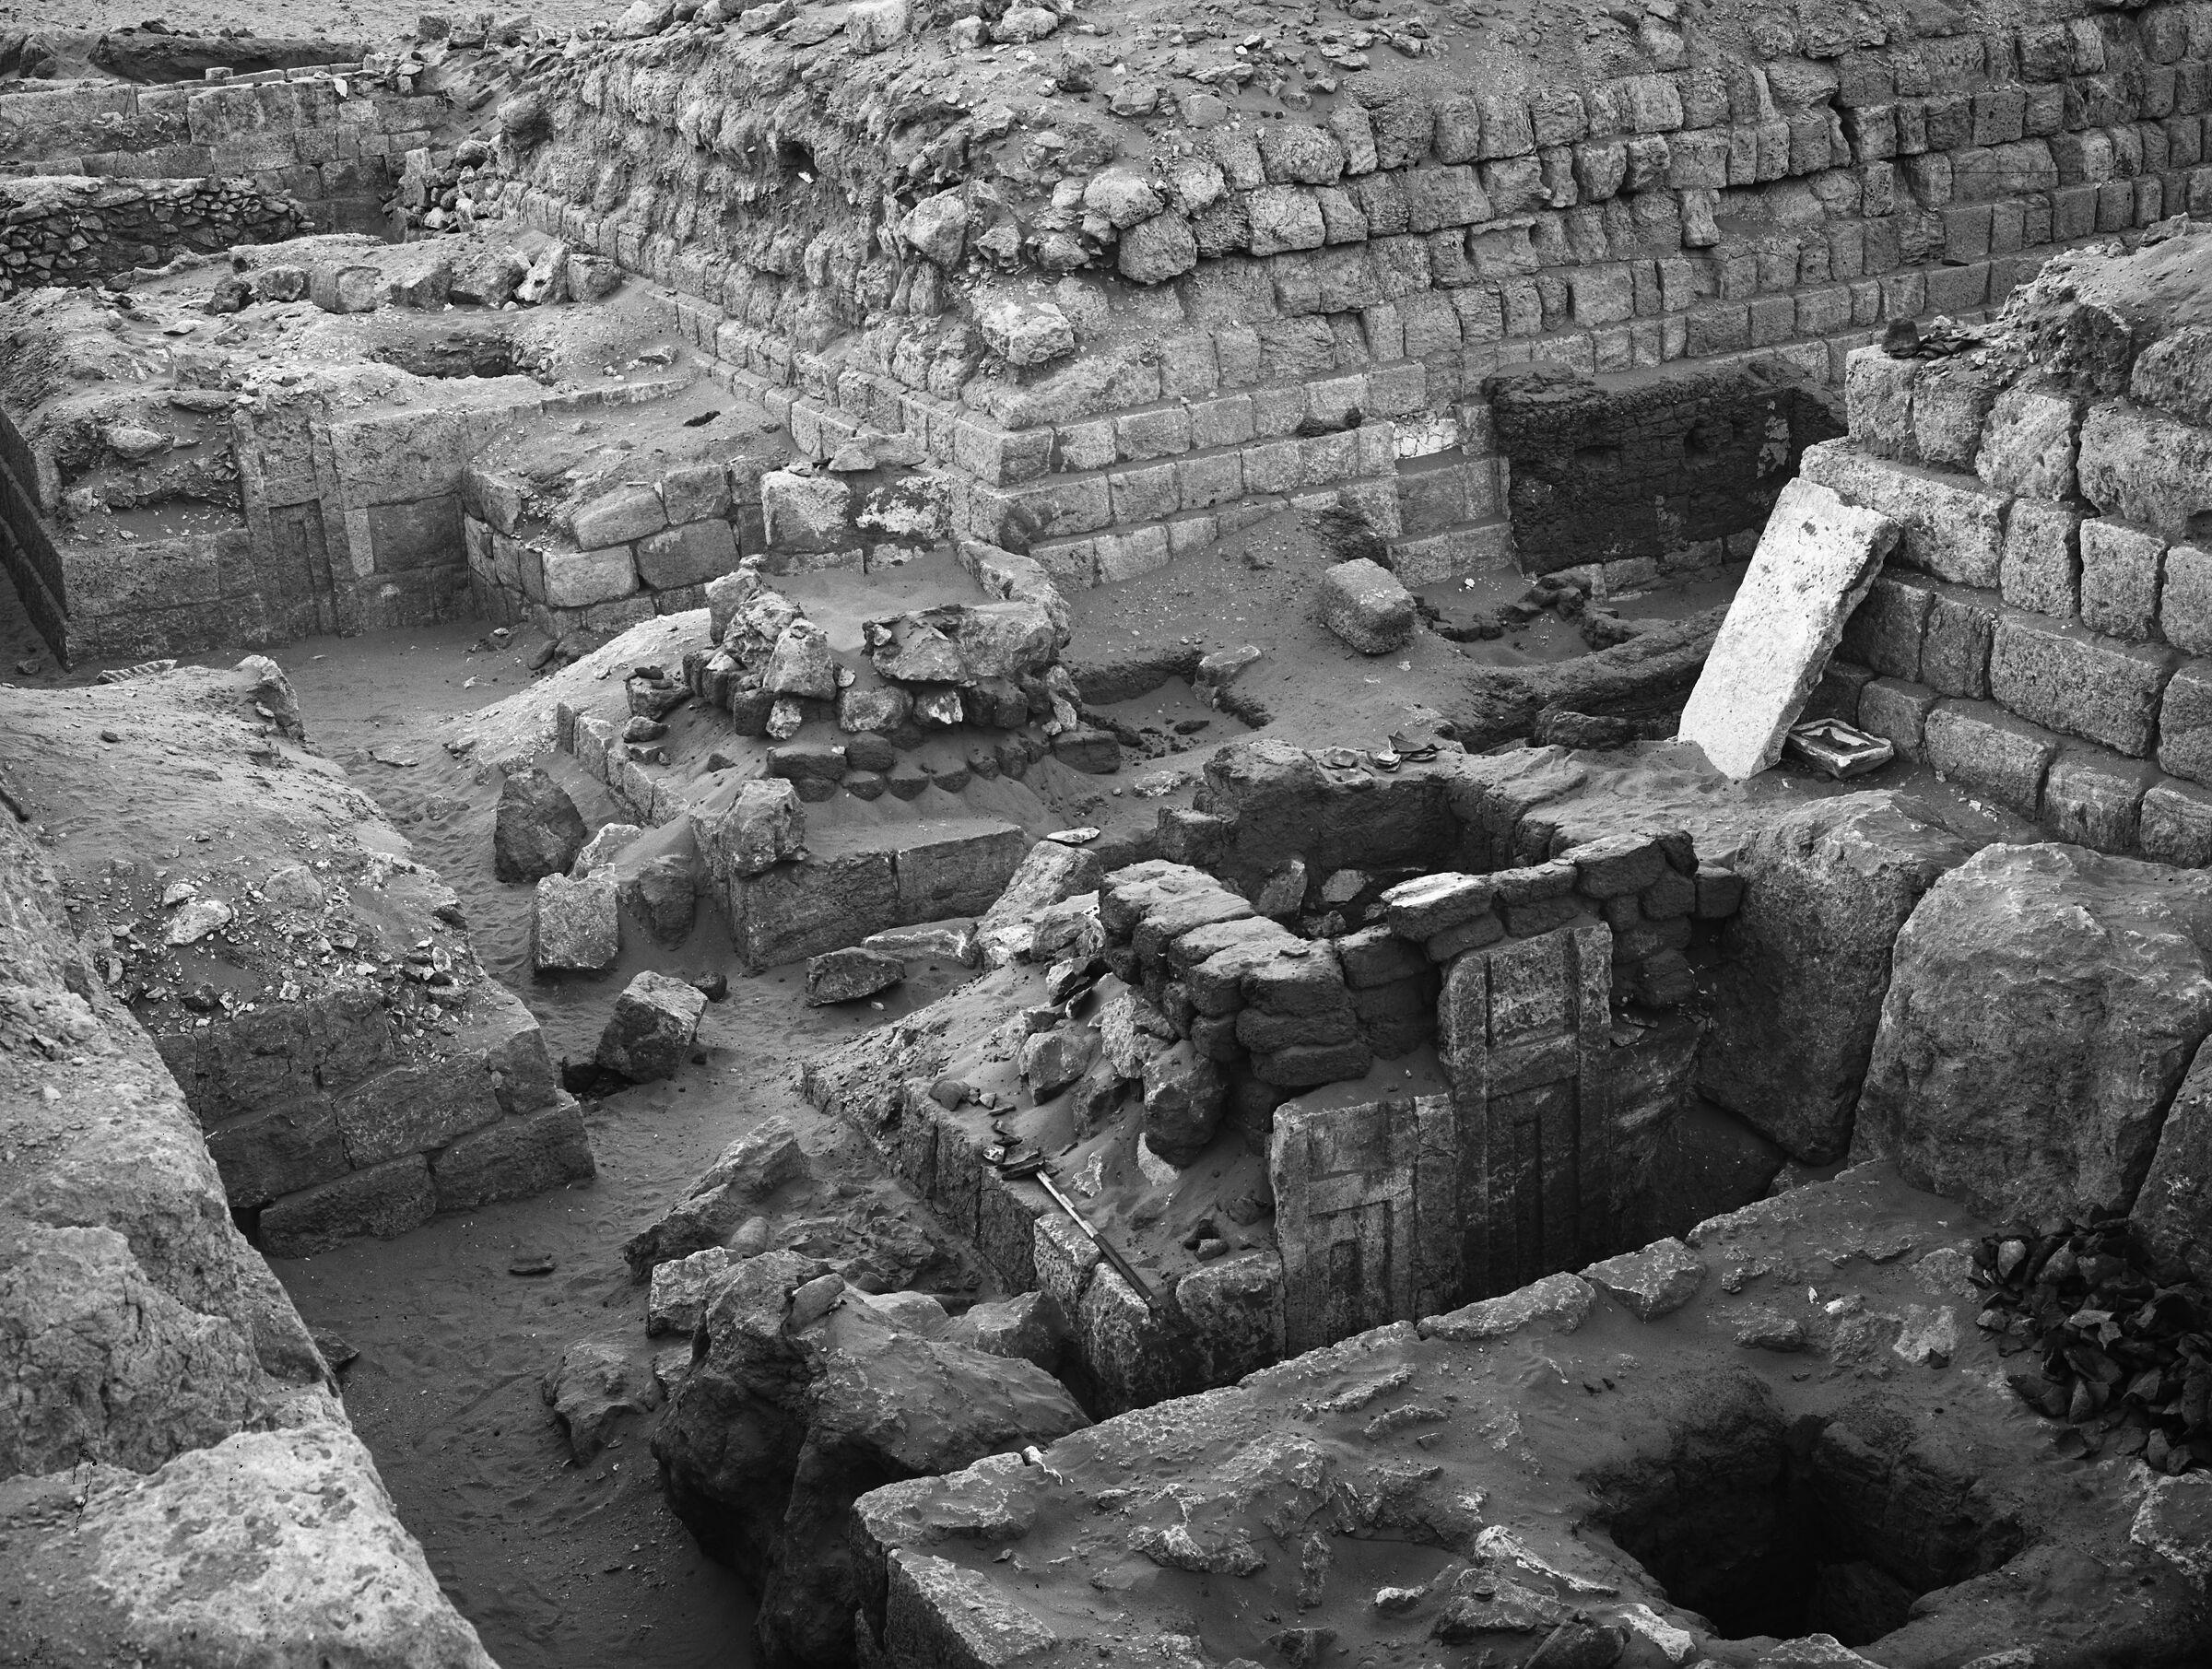 Western Cemetery: Site: Giza; View: G 1219, G 1218, G 1225, G 1217, G 1216, G 1215, G 1214, G 1227